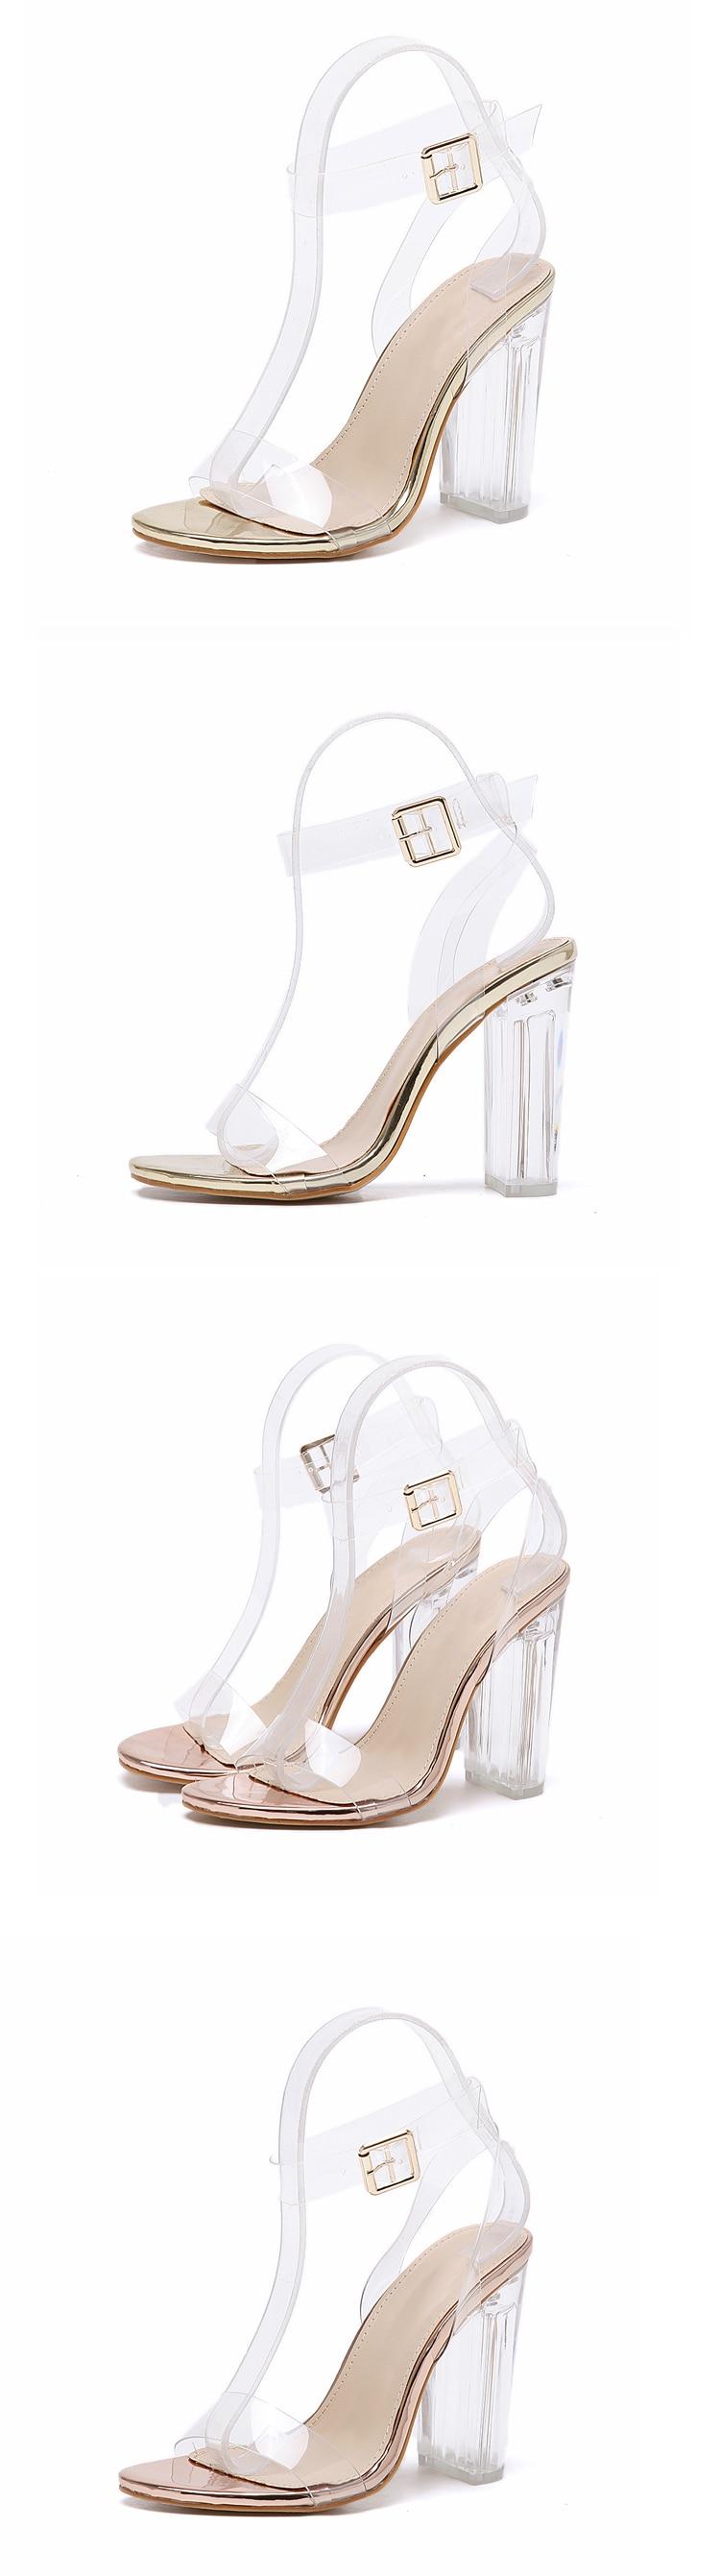 HTB1rj0dXffsK1RjSszgq6yXzpXau Eilyken 2019 New PVC Women Sandals Sexy Clear Transparent Ankle Strap High Heels Party Sandals Women Shoes Size 35-42